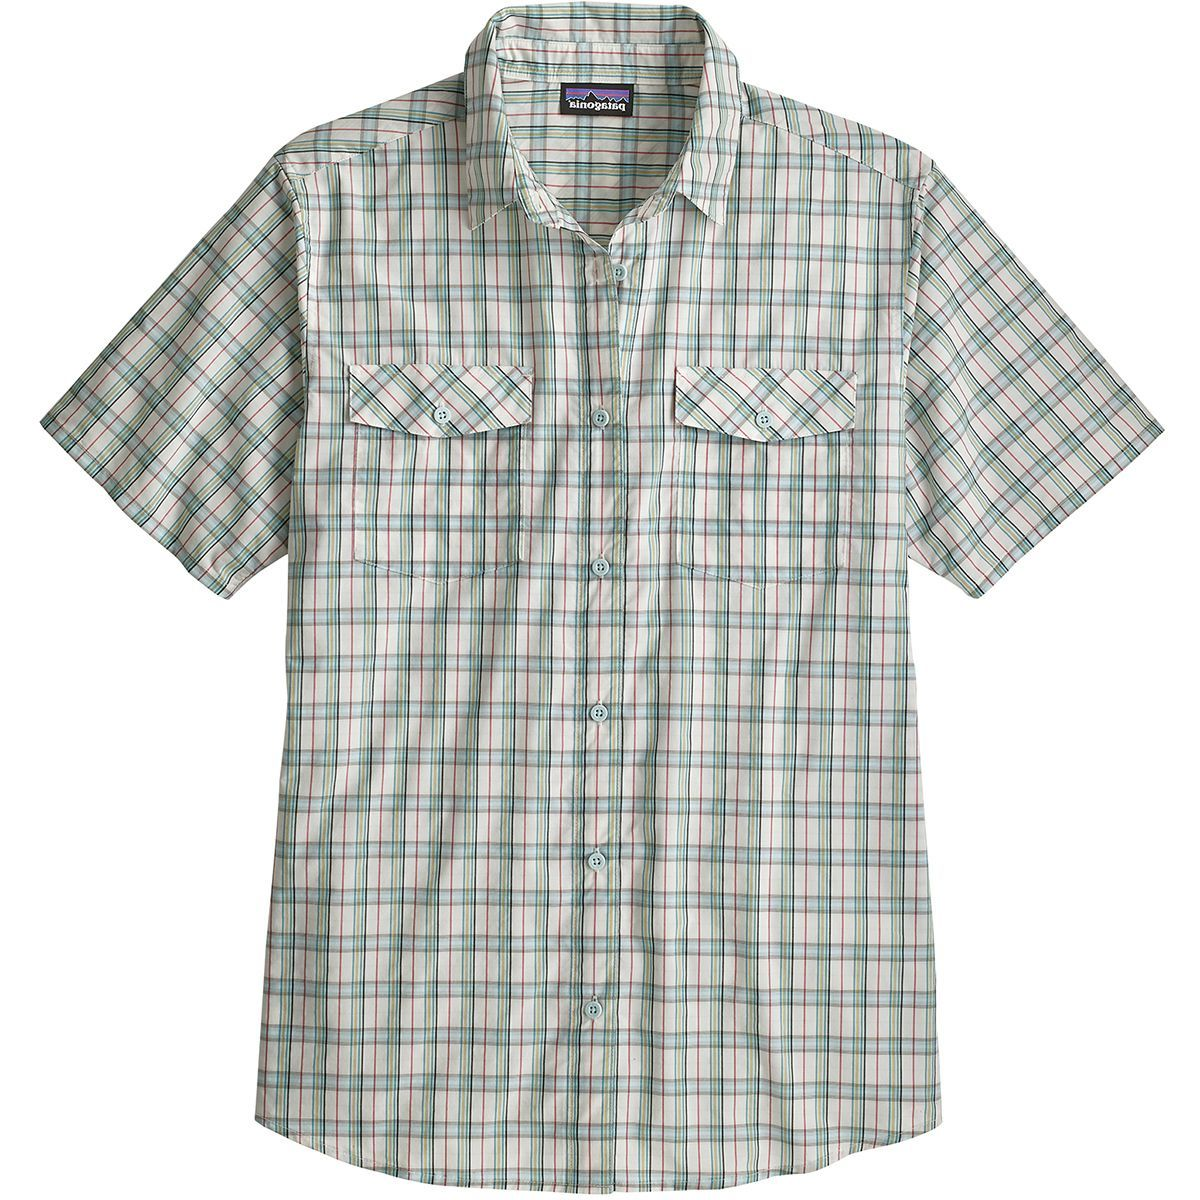 Patagonia High Moss Short-Sleeve Shirt - Men's